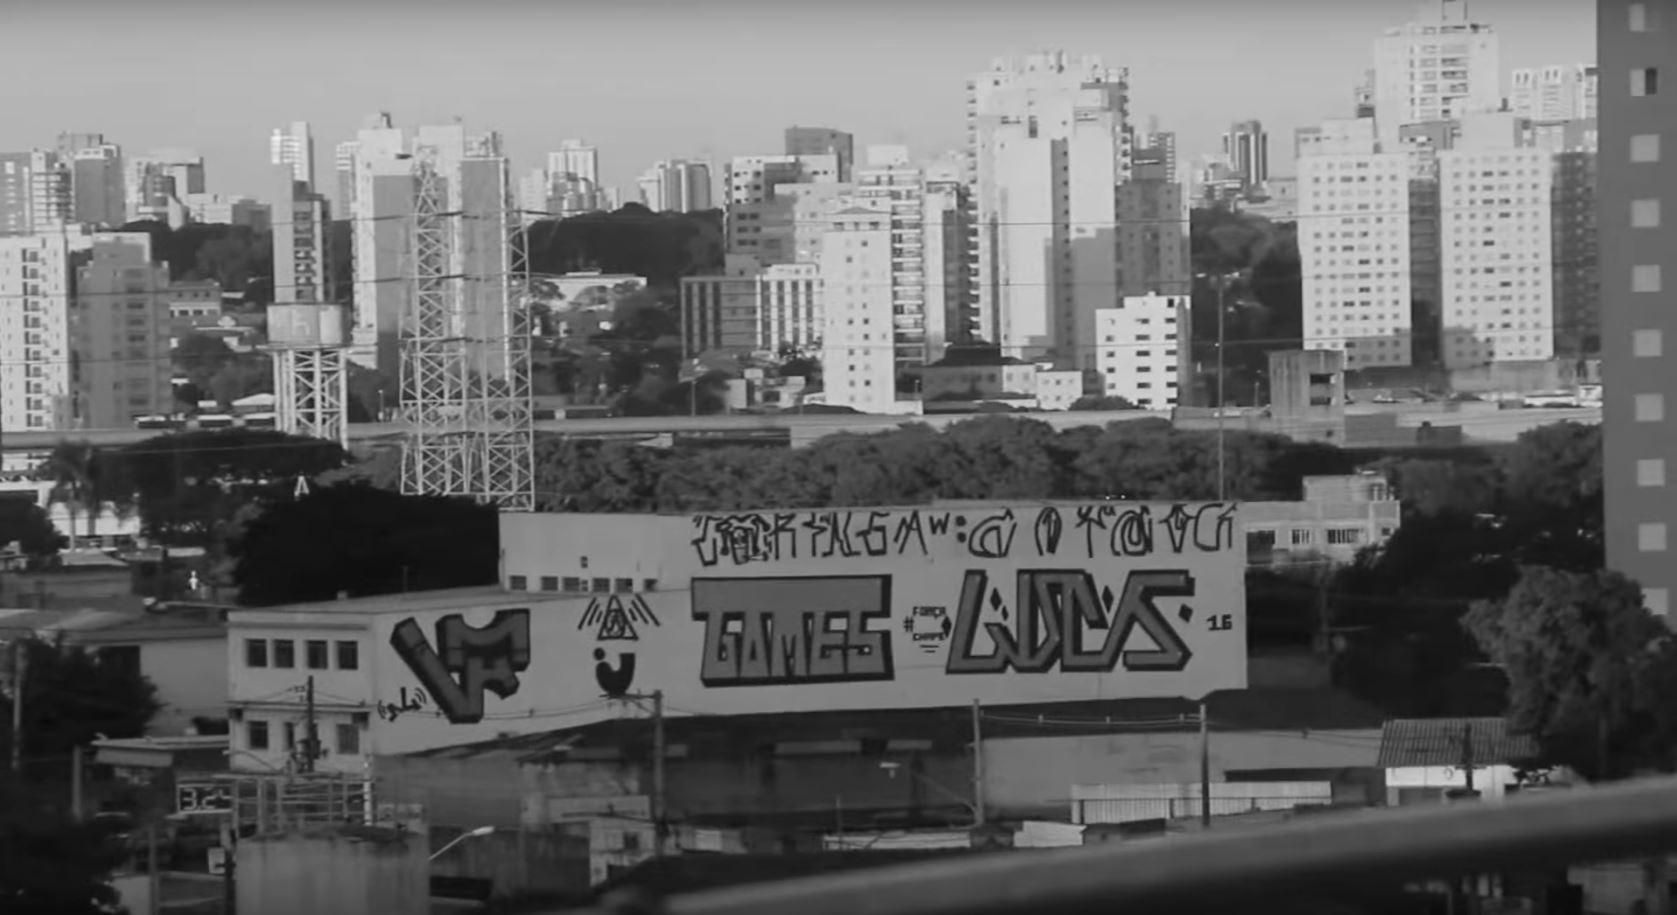 escrita abc sp vandalismo gomes lucs fulanos pixo tag graffiti writters dionisio arte